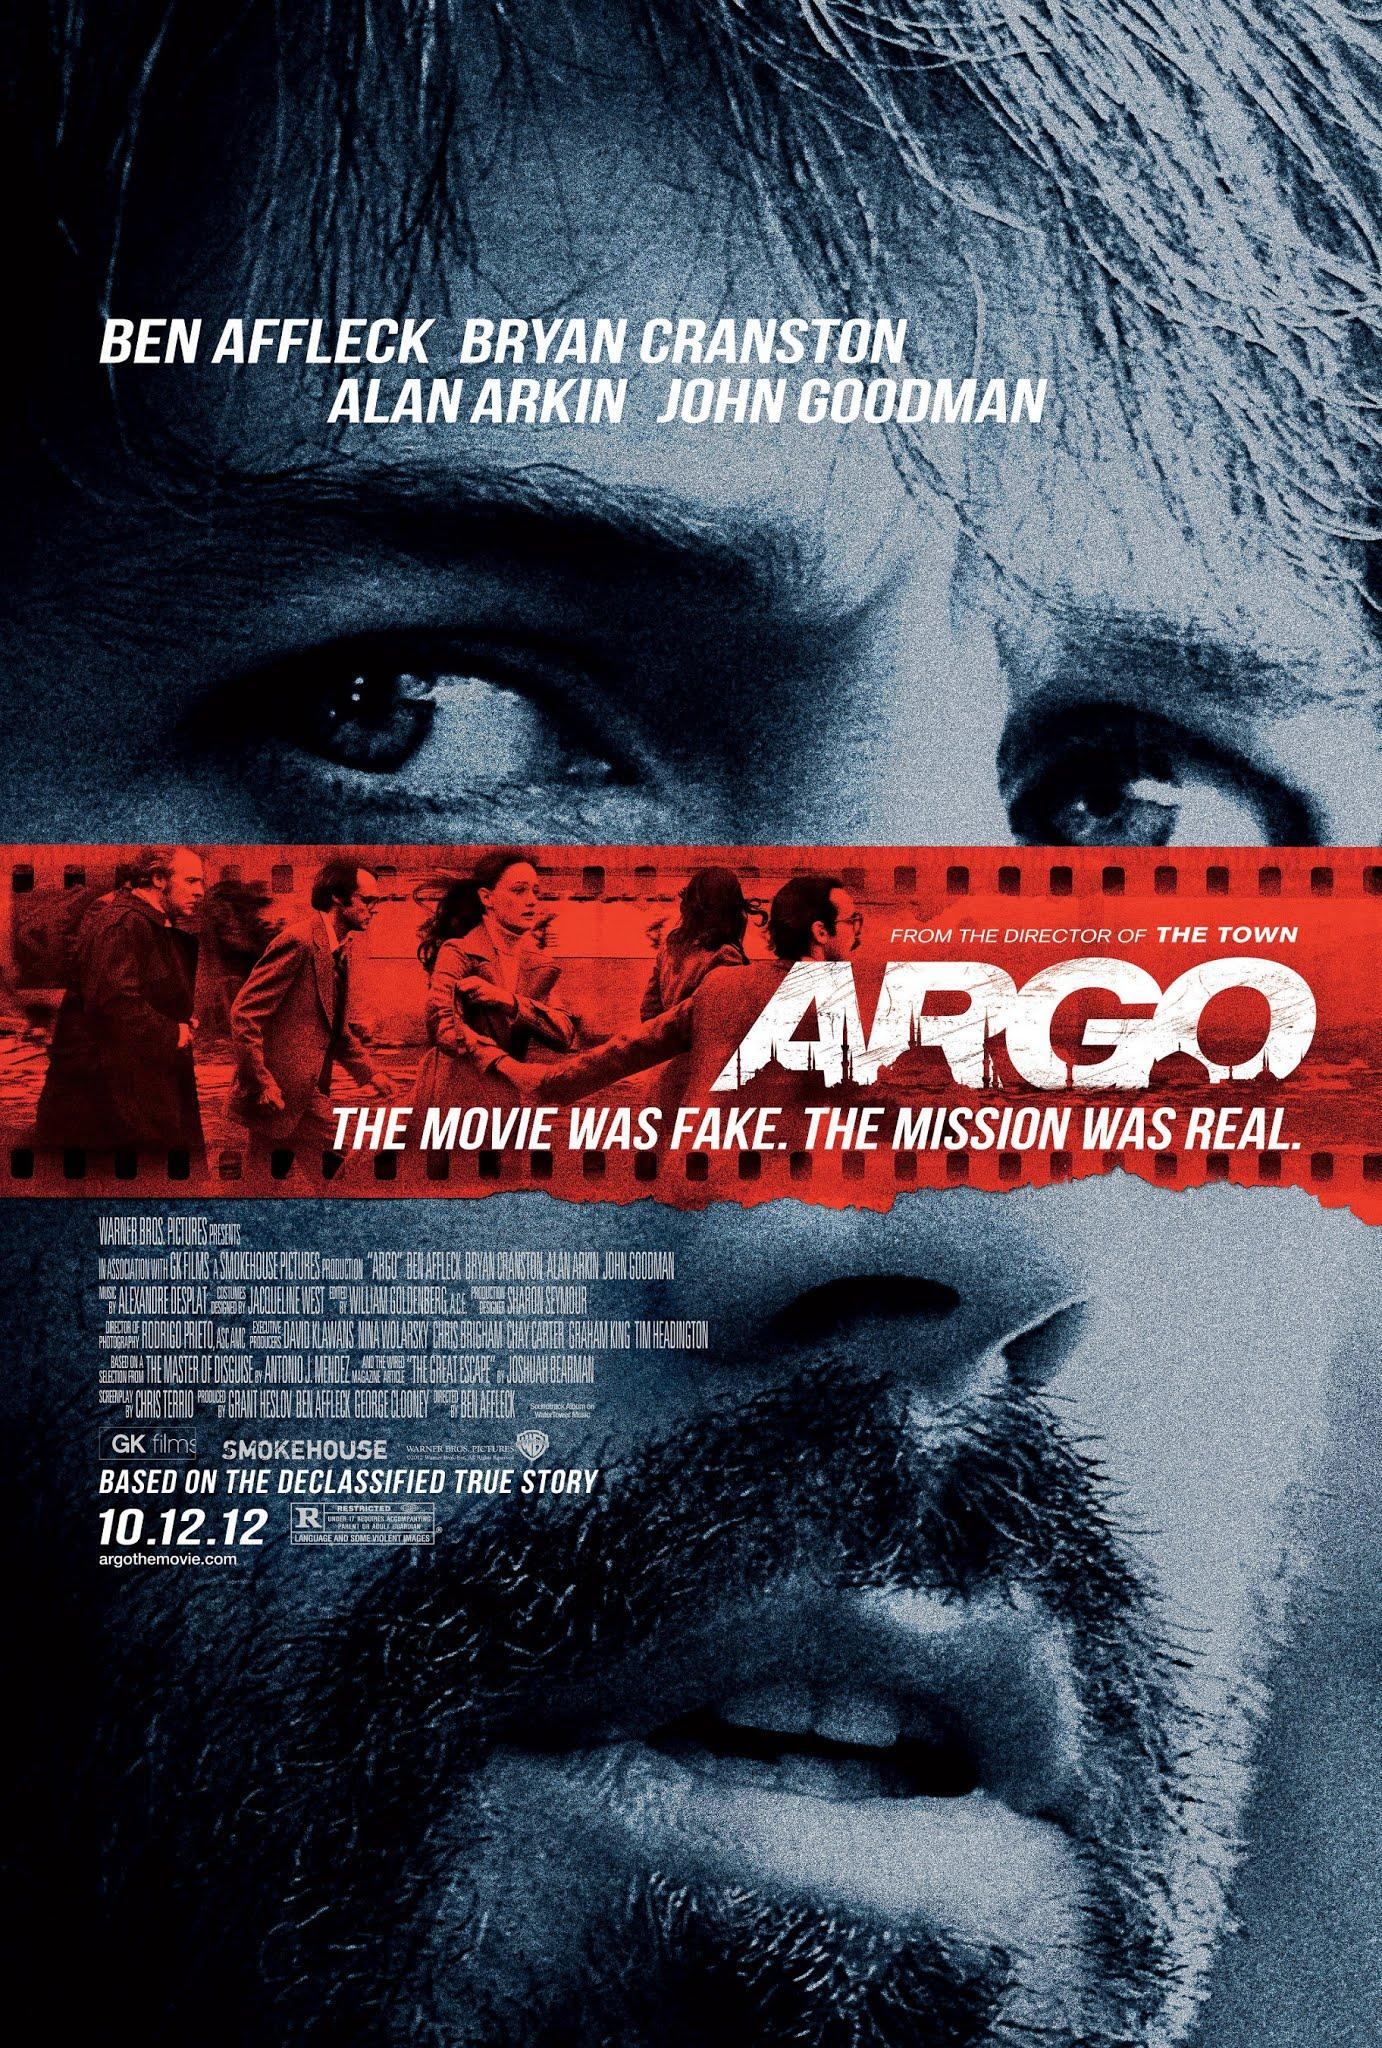 operacja argo film recenzja iran rewolucja affleck cranston arkin goodman